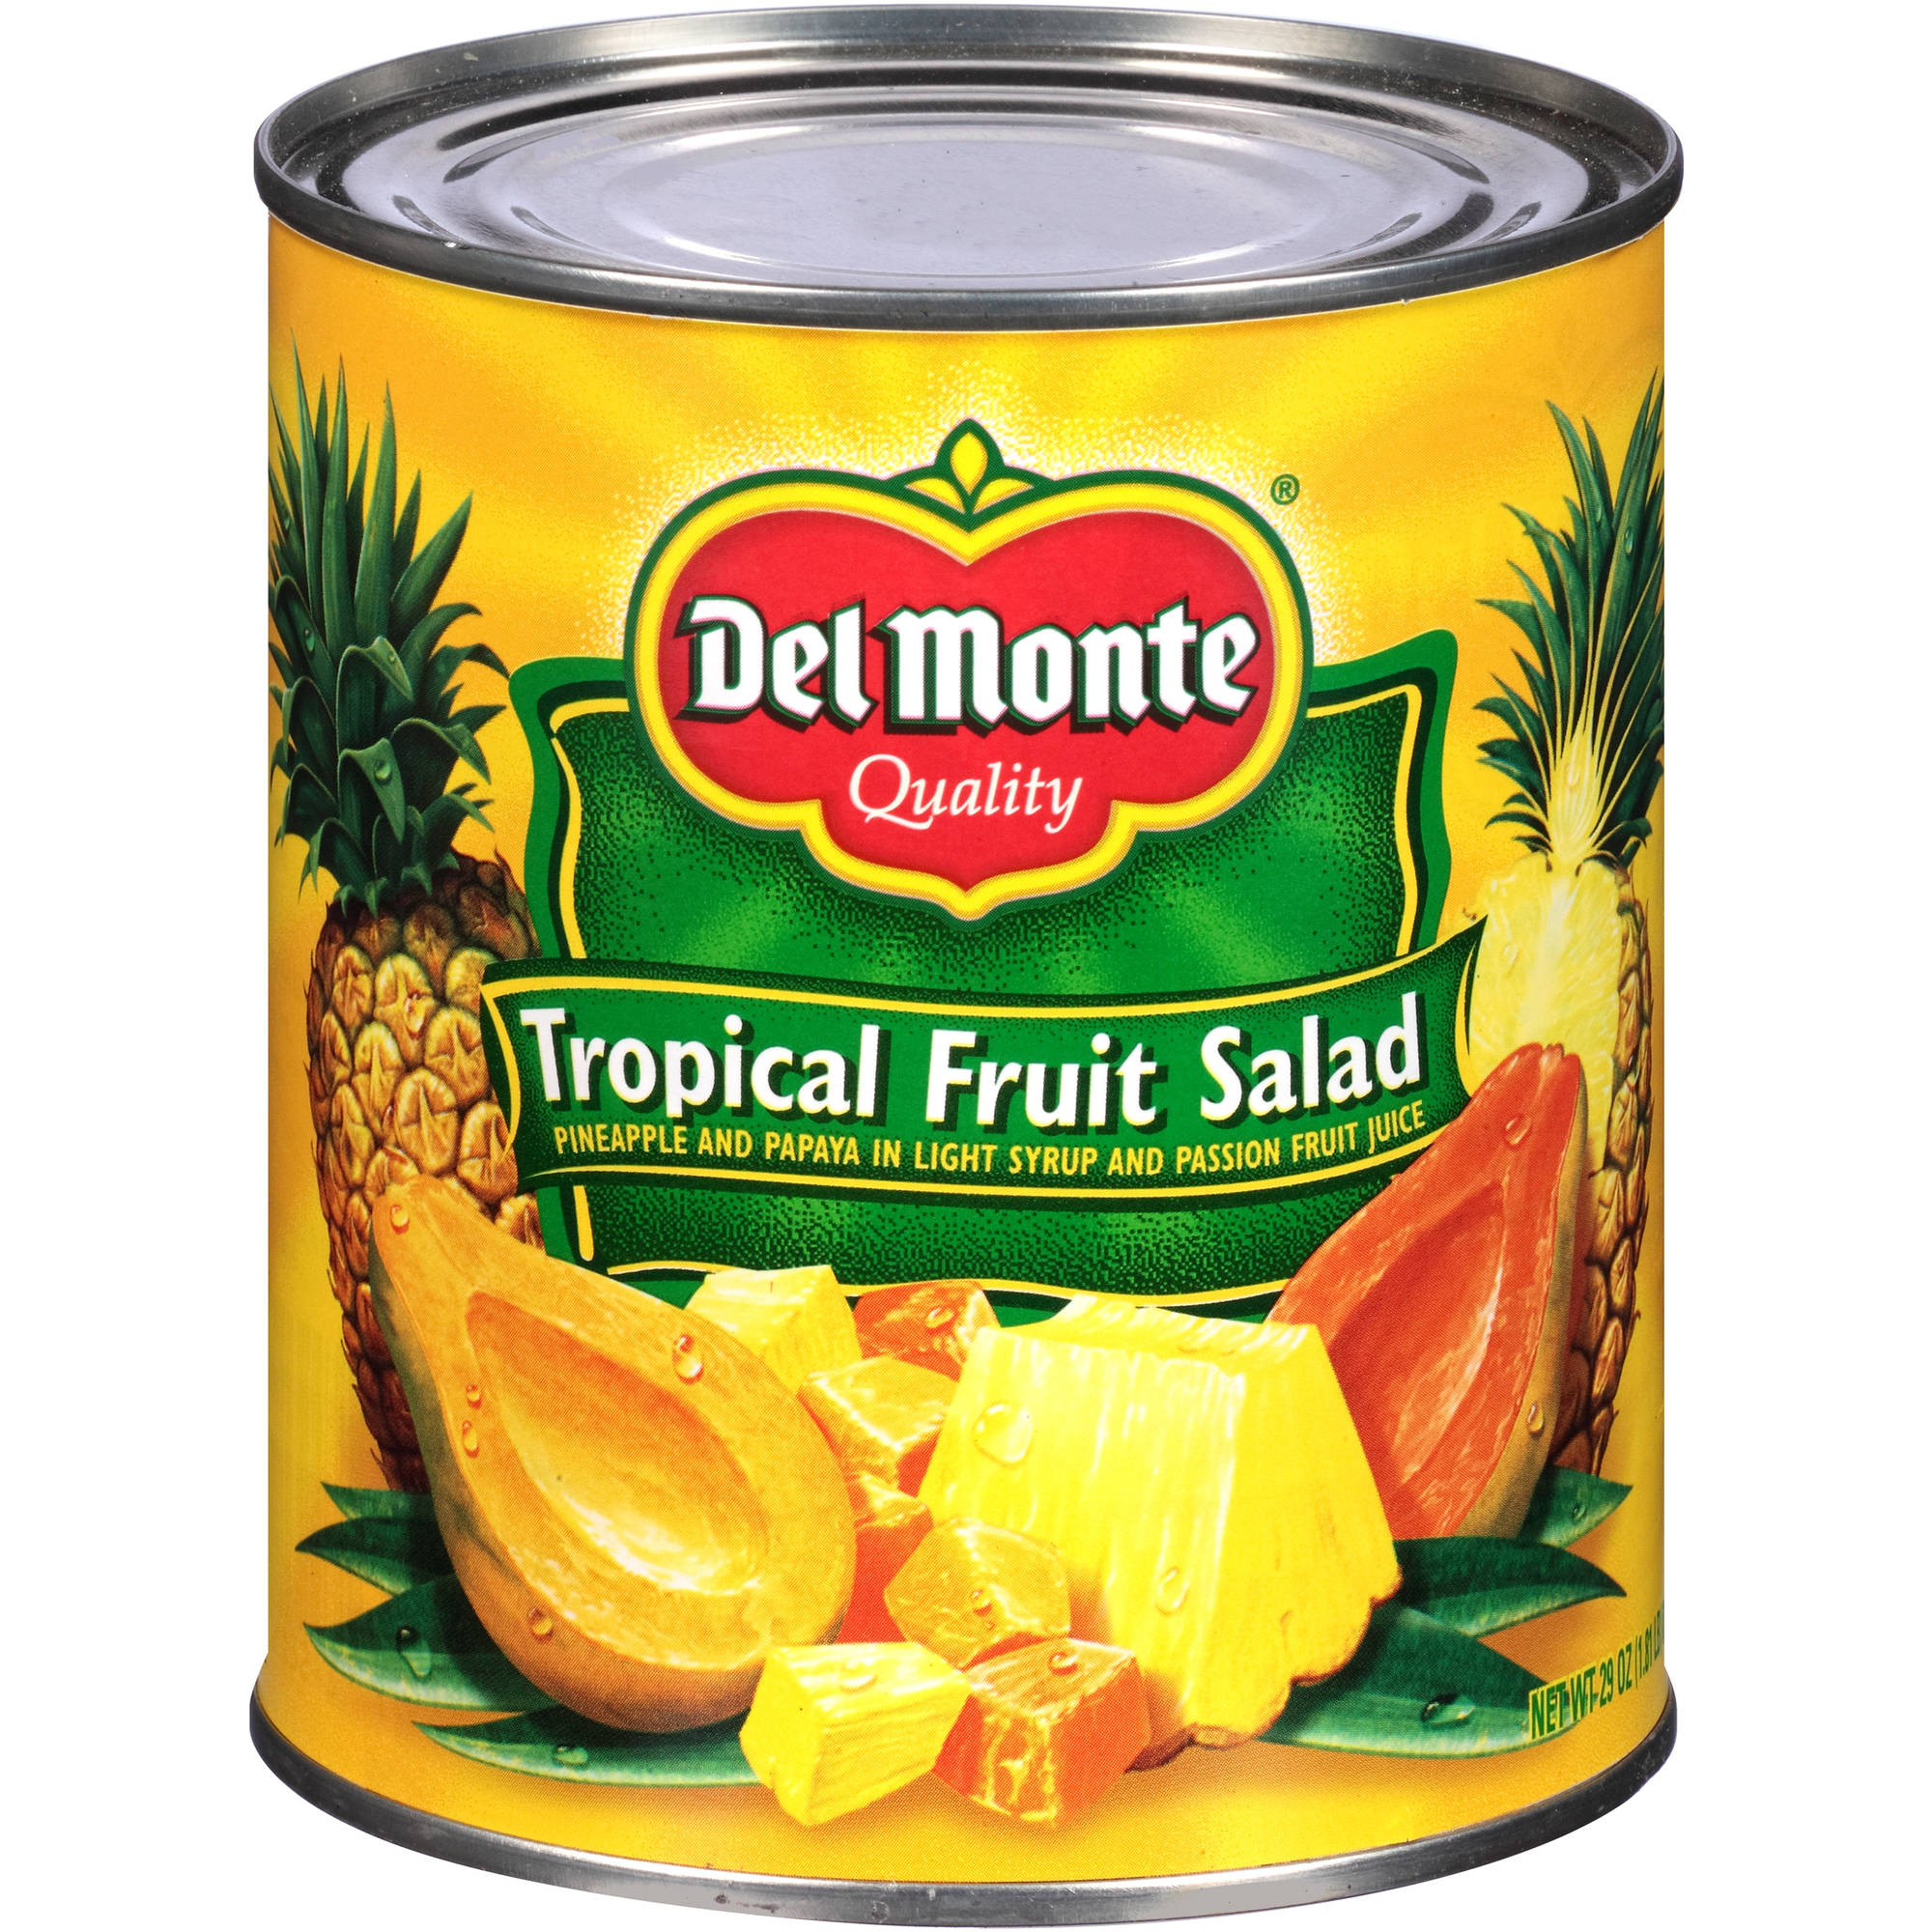 Del Monte Tropical Fruit Salad, 29 oz